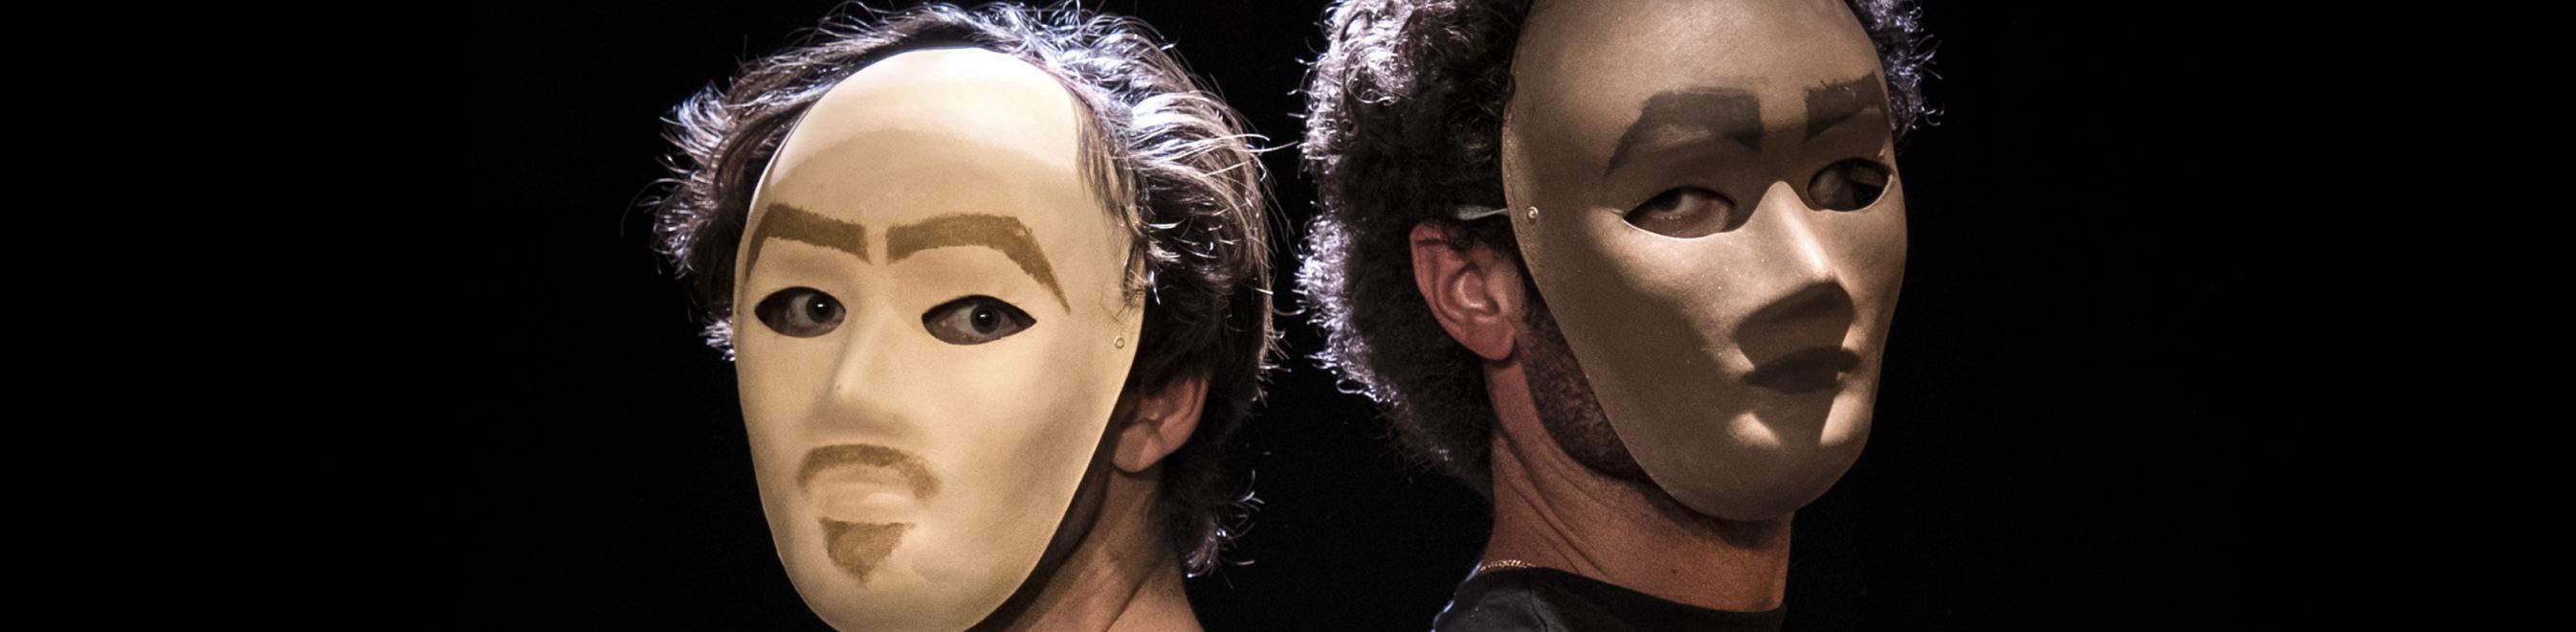 15/6 - Fortezza Vecchia - Teatro Vertigo HAMLETOTELLO